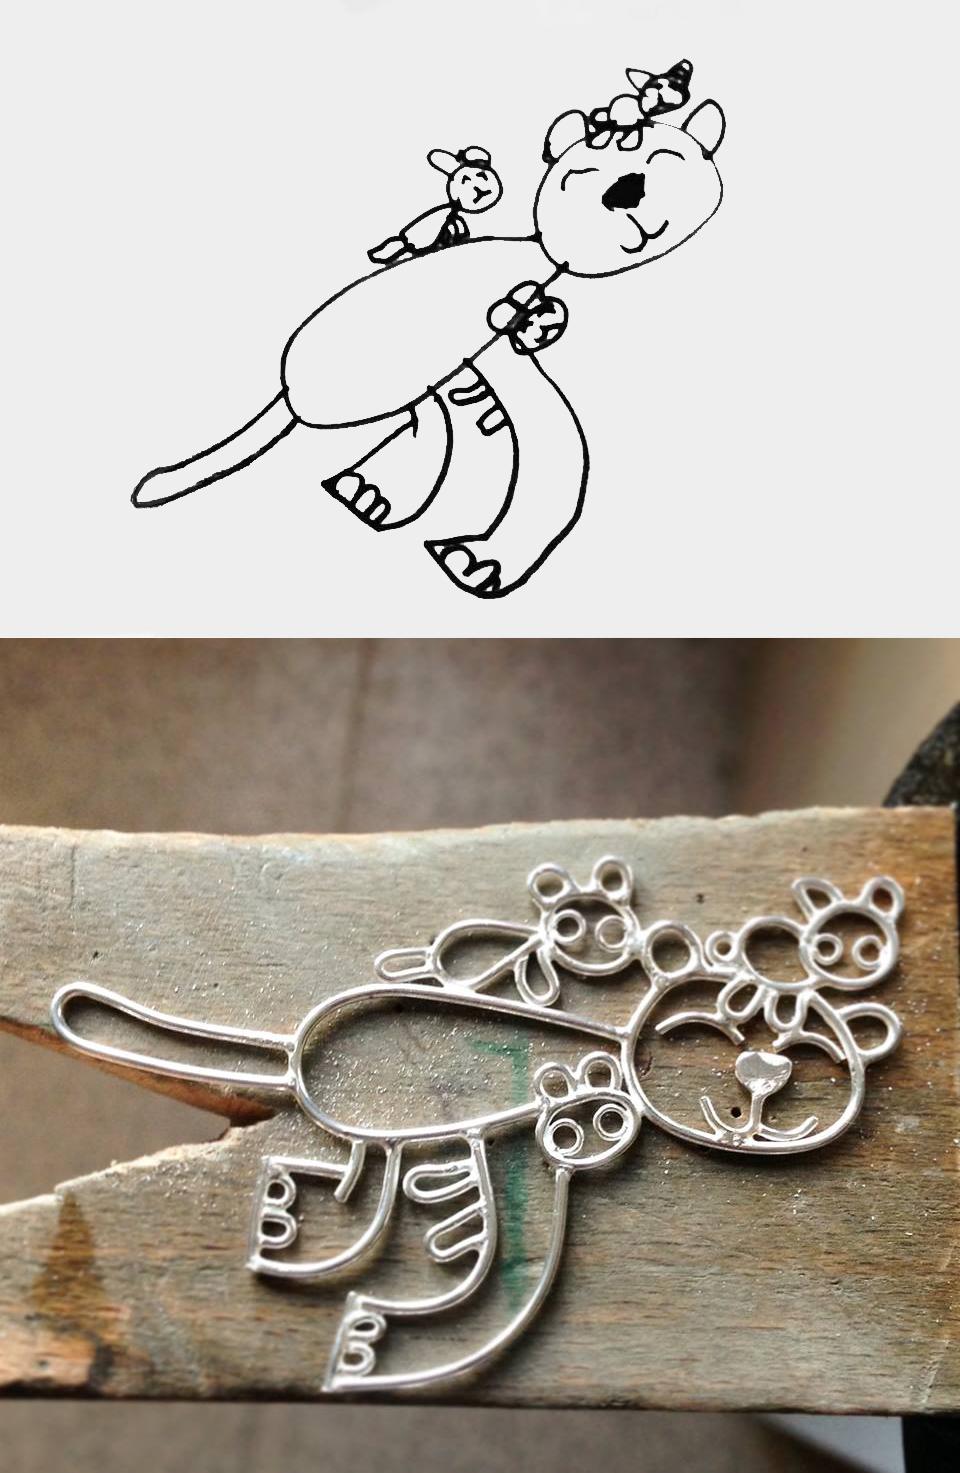 children's drawings jewellery, children's drawings turned into jewellery, Sarah Hoare, handmade jewellery, bird and monkey, bespoke jewellery, kids art jewellery,